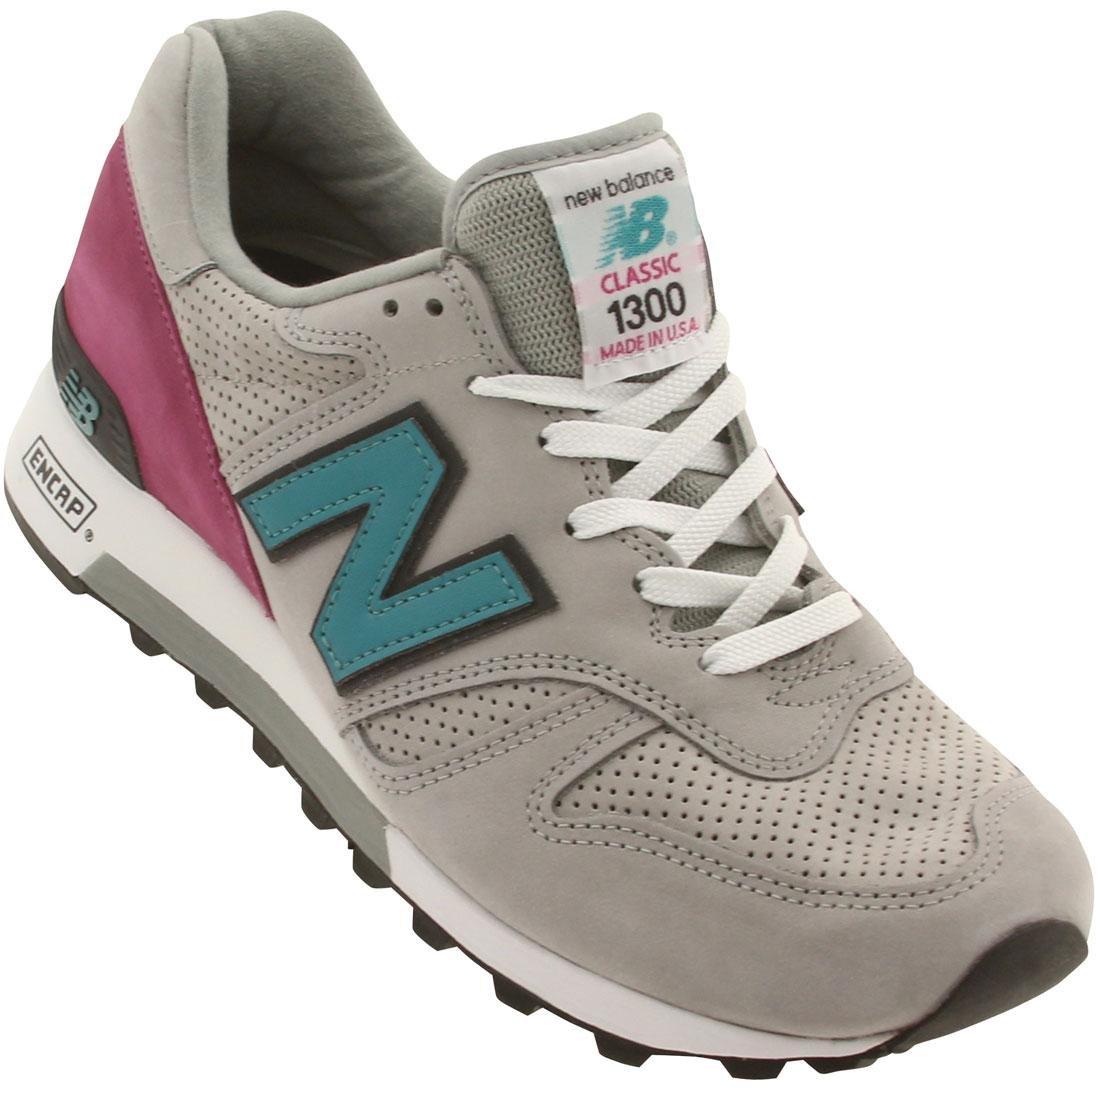 sale retailer 751cb 60a8c Amazon.com   New Balance Men s 1300 Enduring Purpose-Made USA Fashion  Sneaker   Running